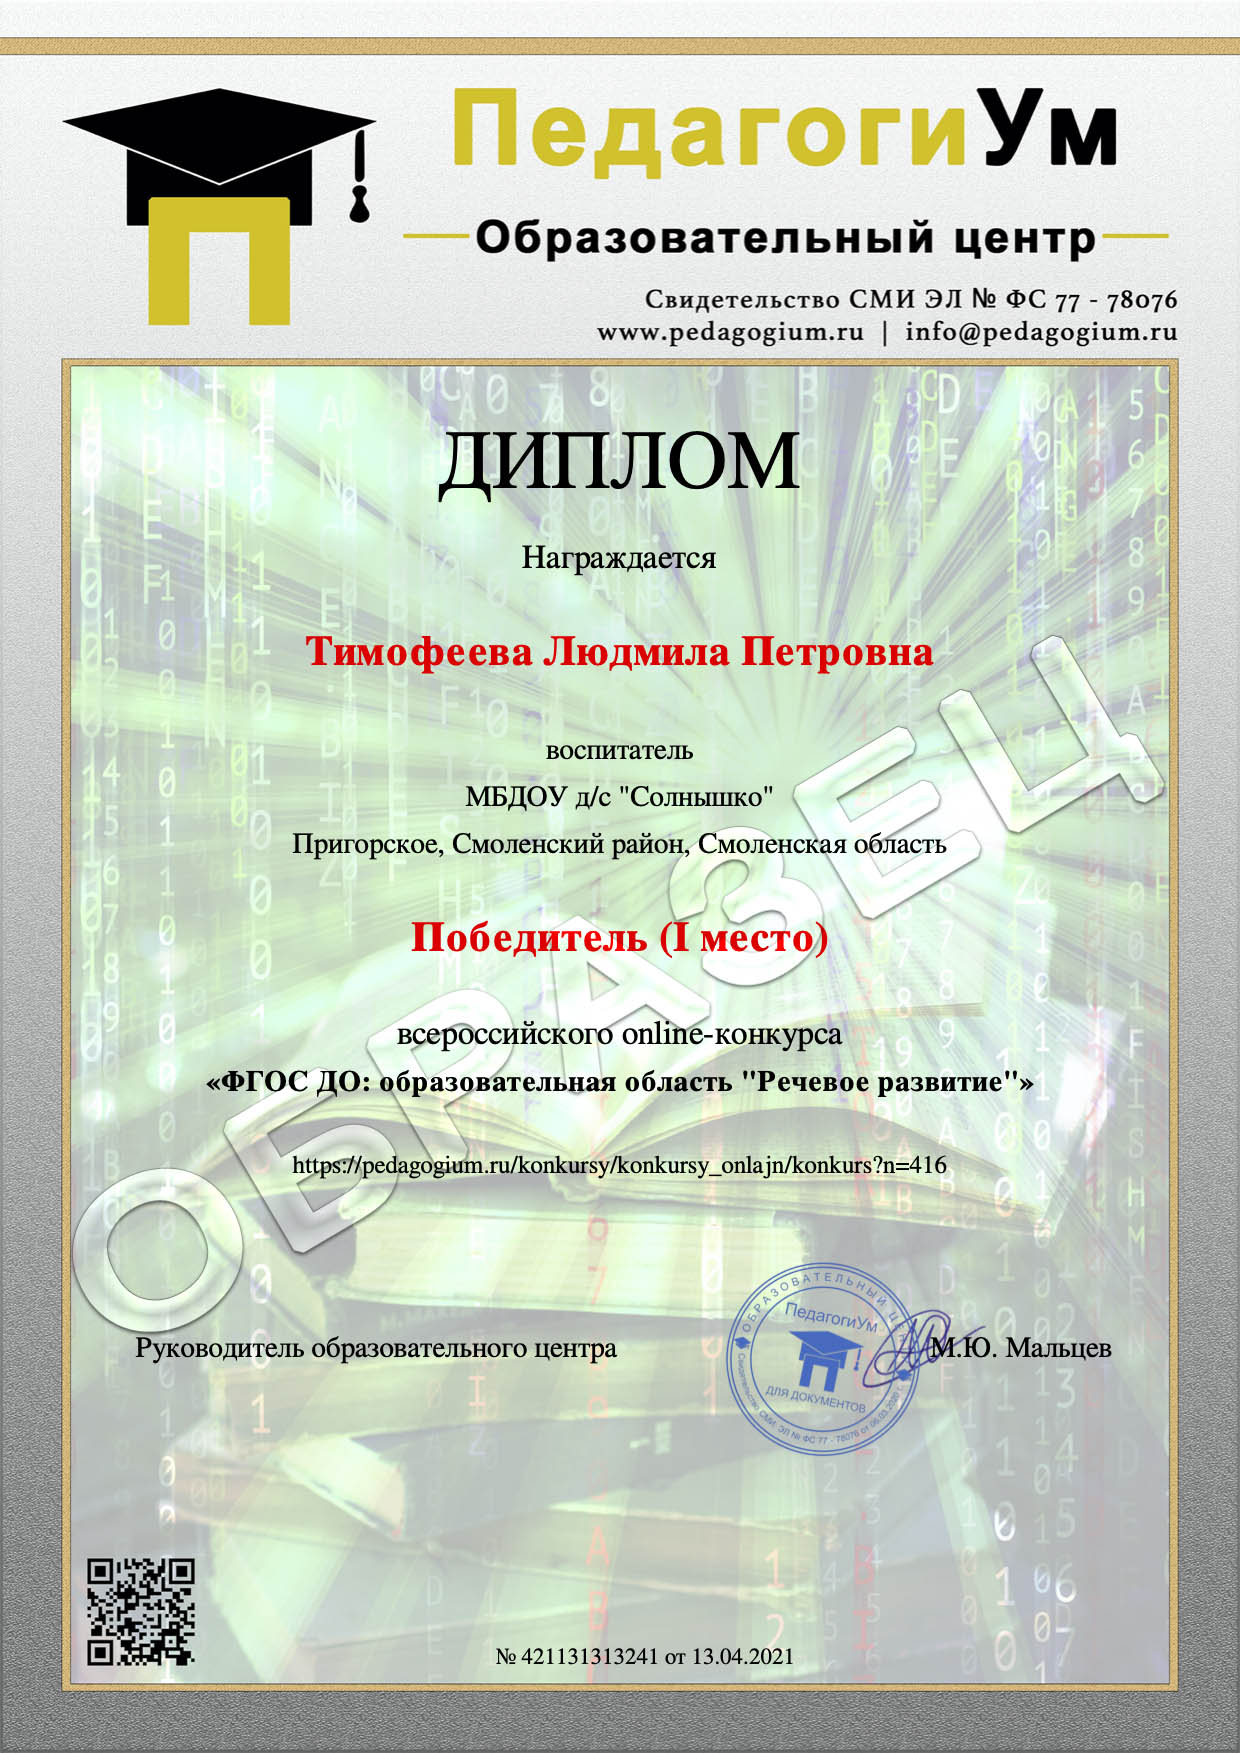 Образец документа педагогу-участнику Онлайн-конкурса центра ПедагогиУм.